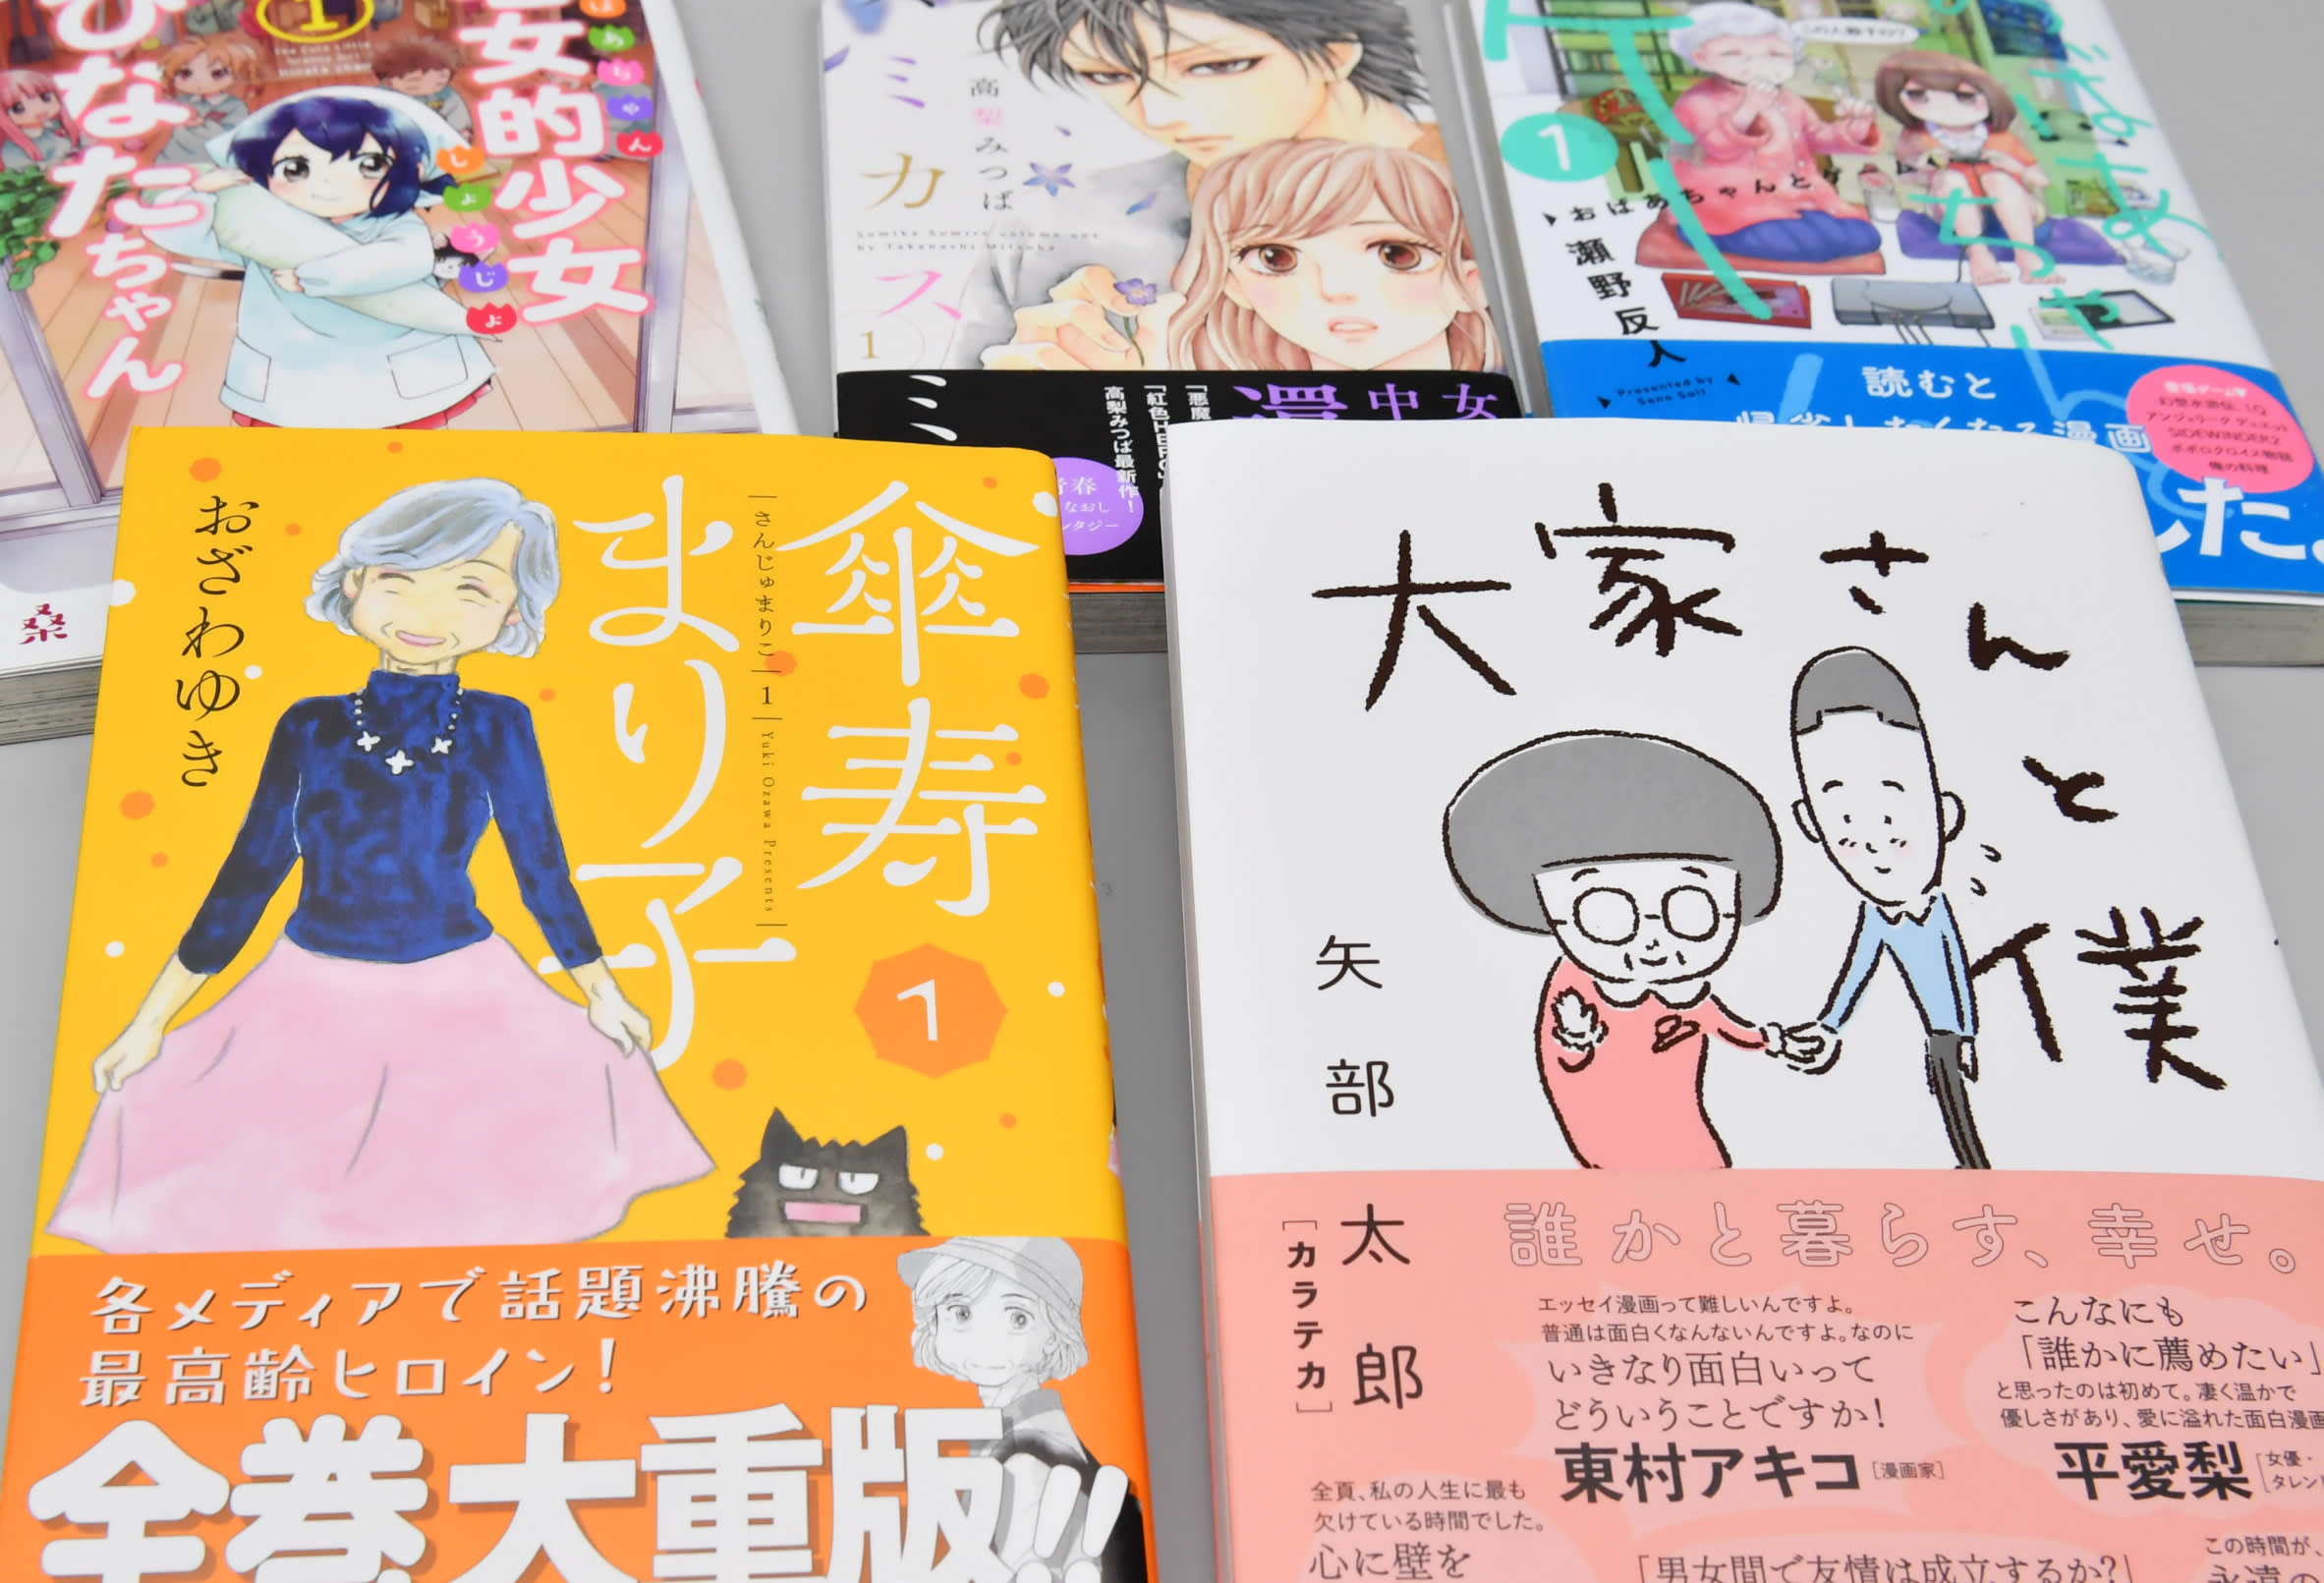 Il manga Oya-san to Boku diventa anime